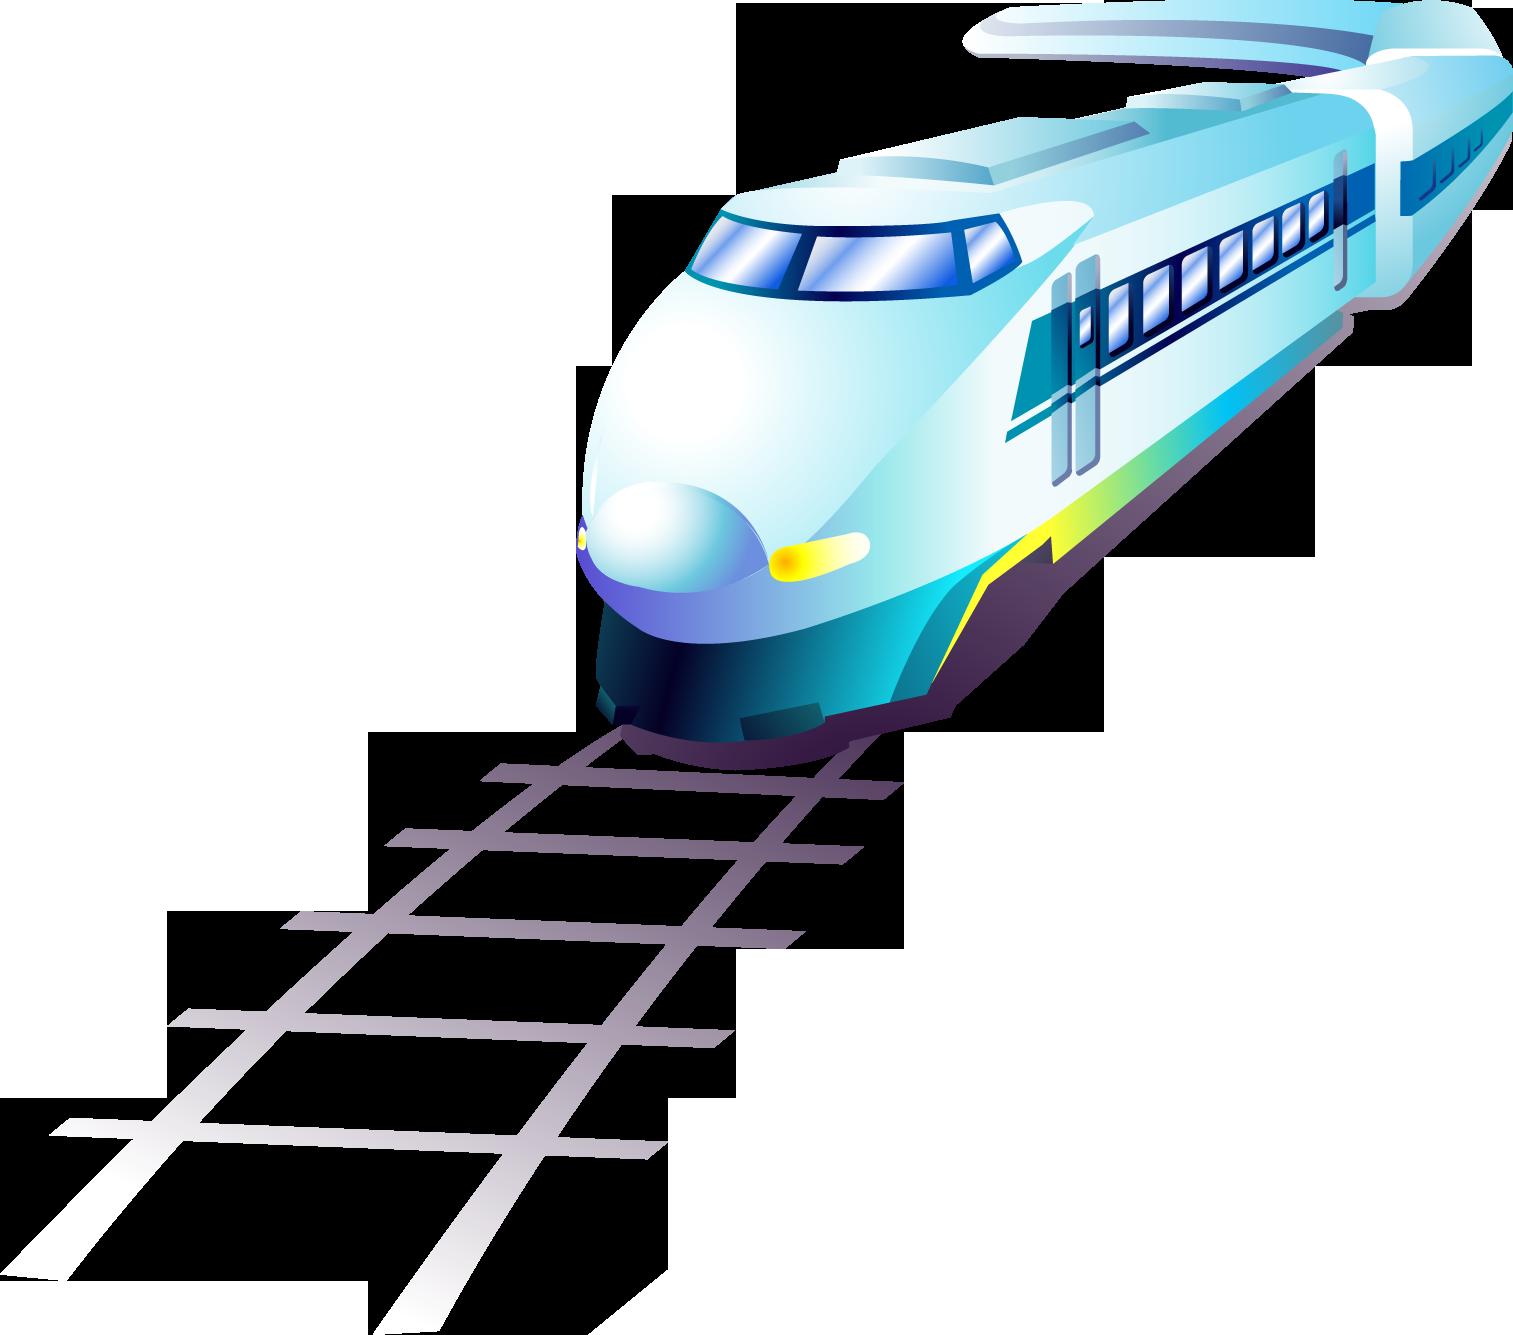 Картинки по запросу поезд картинка